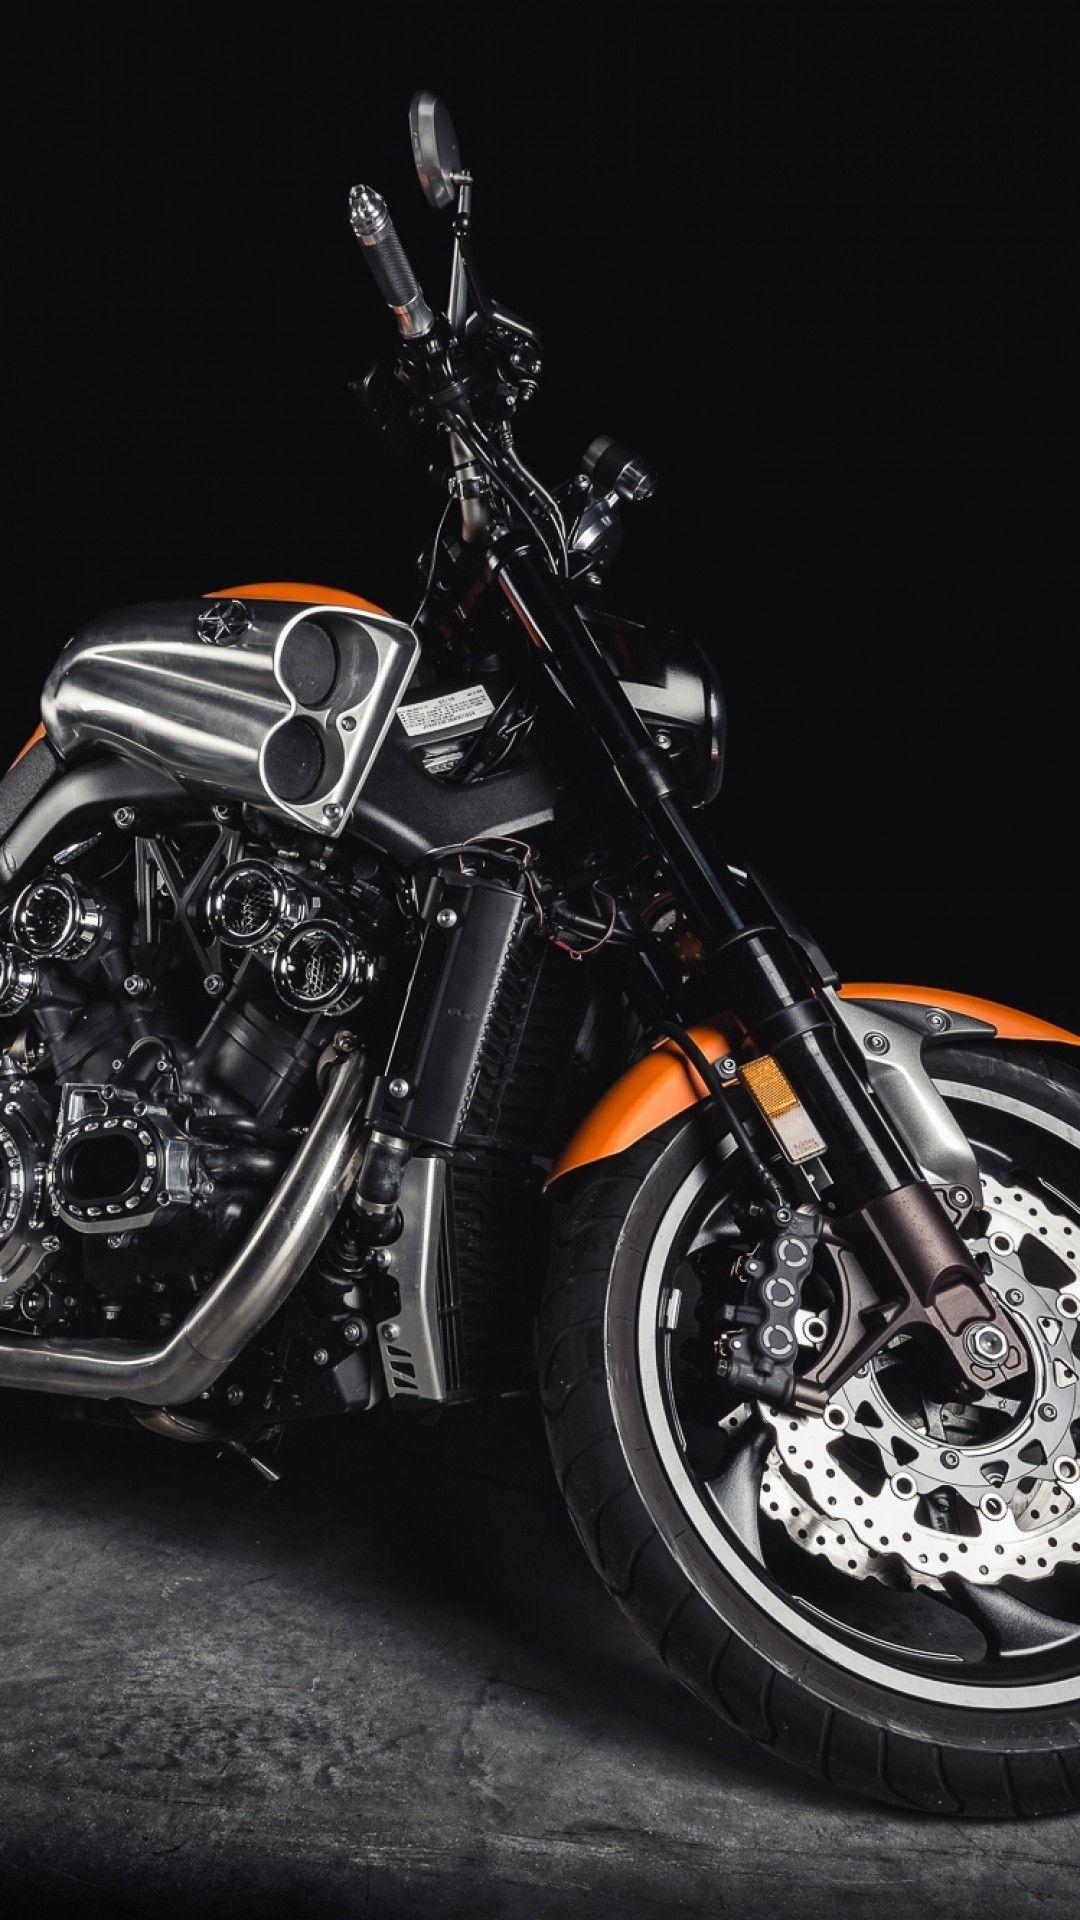 18 Harley Davidson Hd Iphone Wallpapers Wallpaperboat